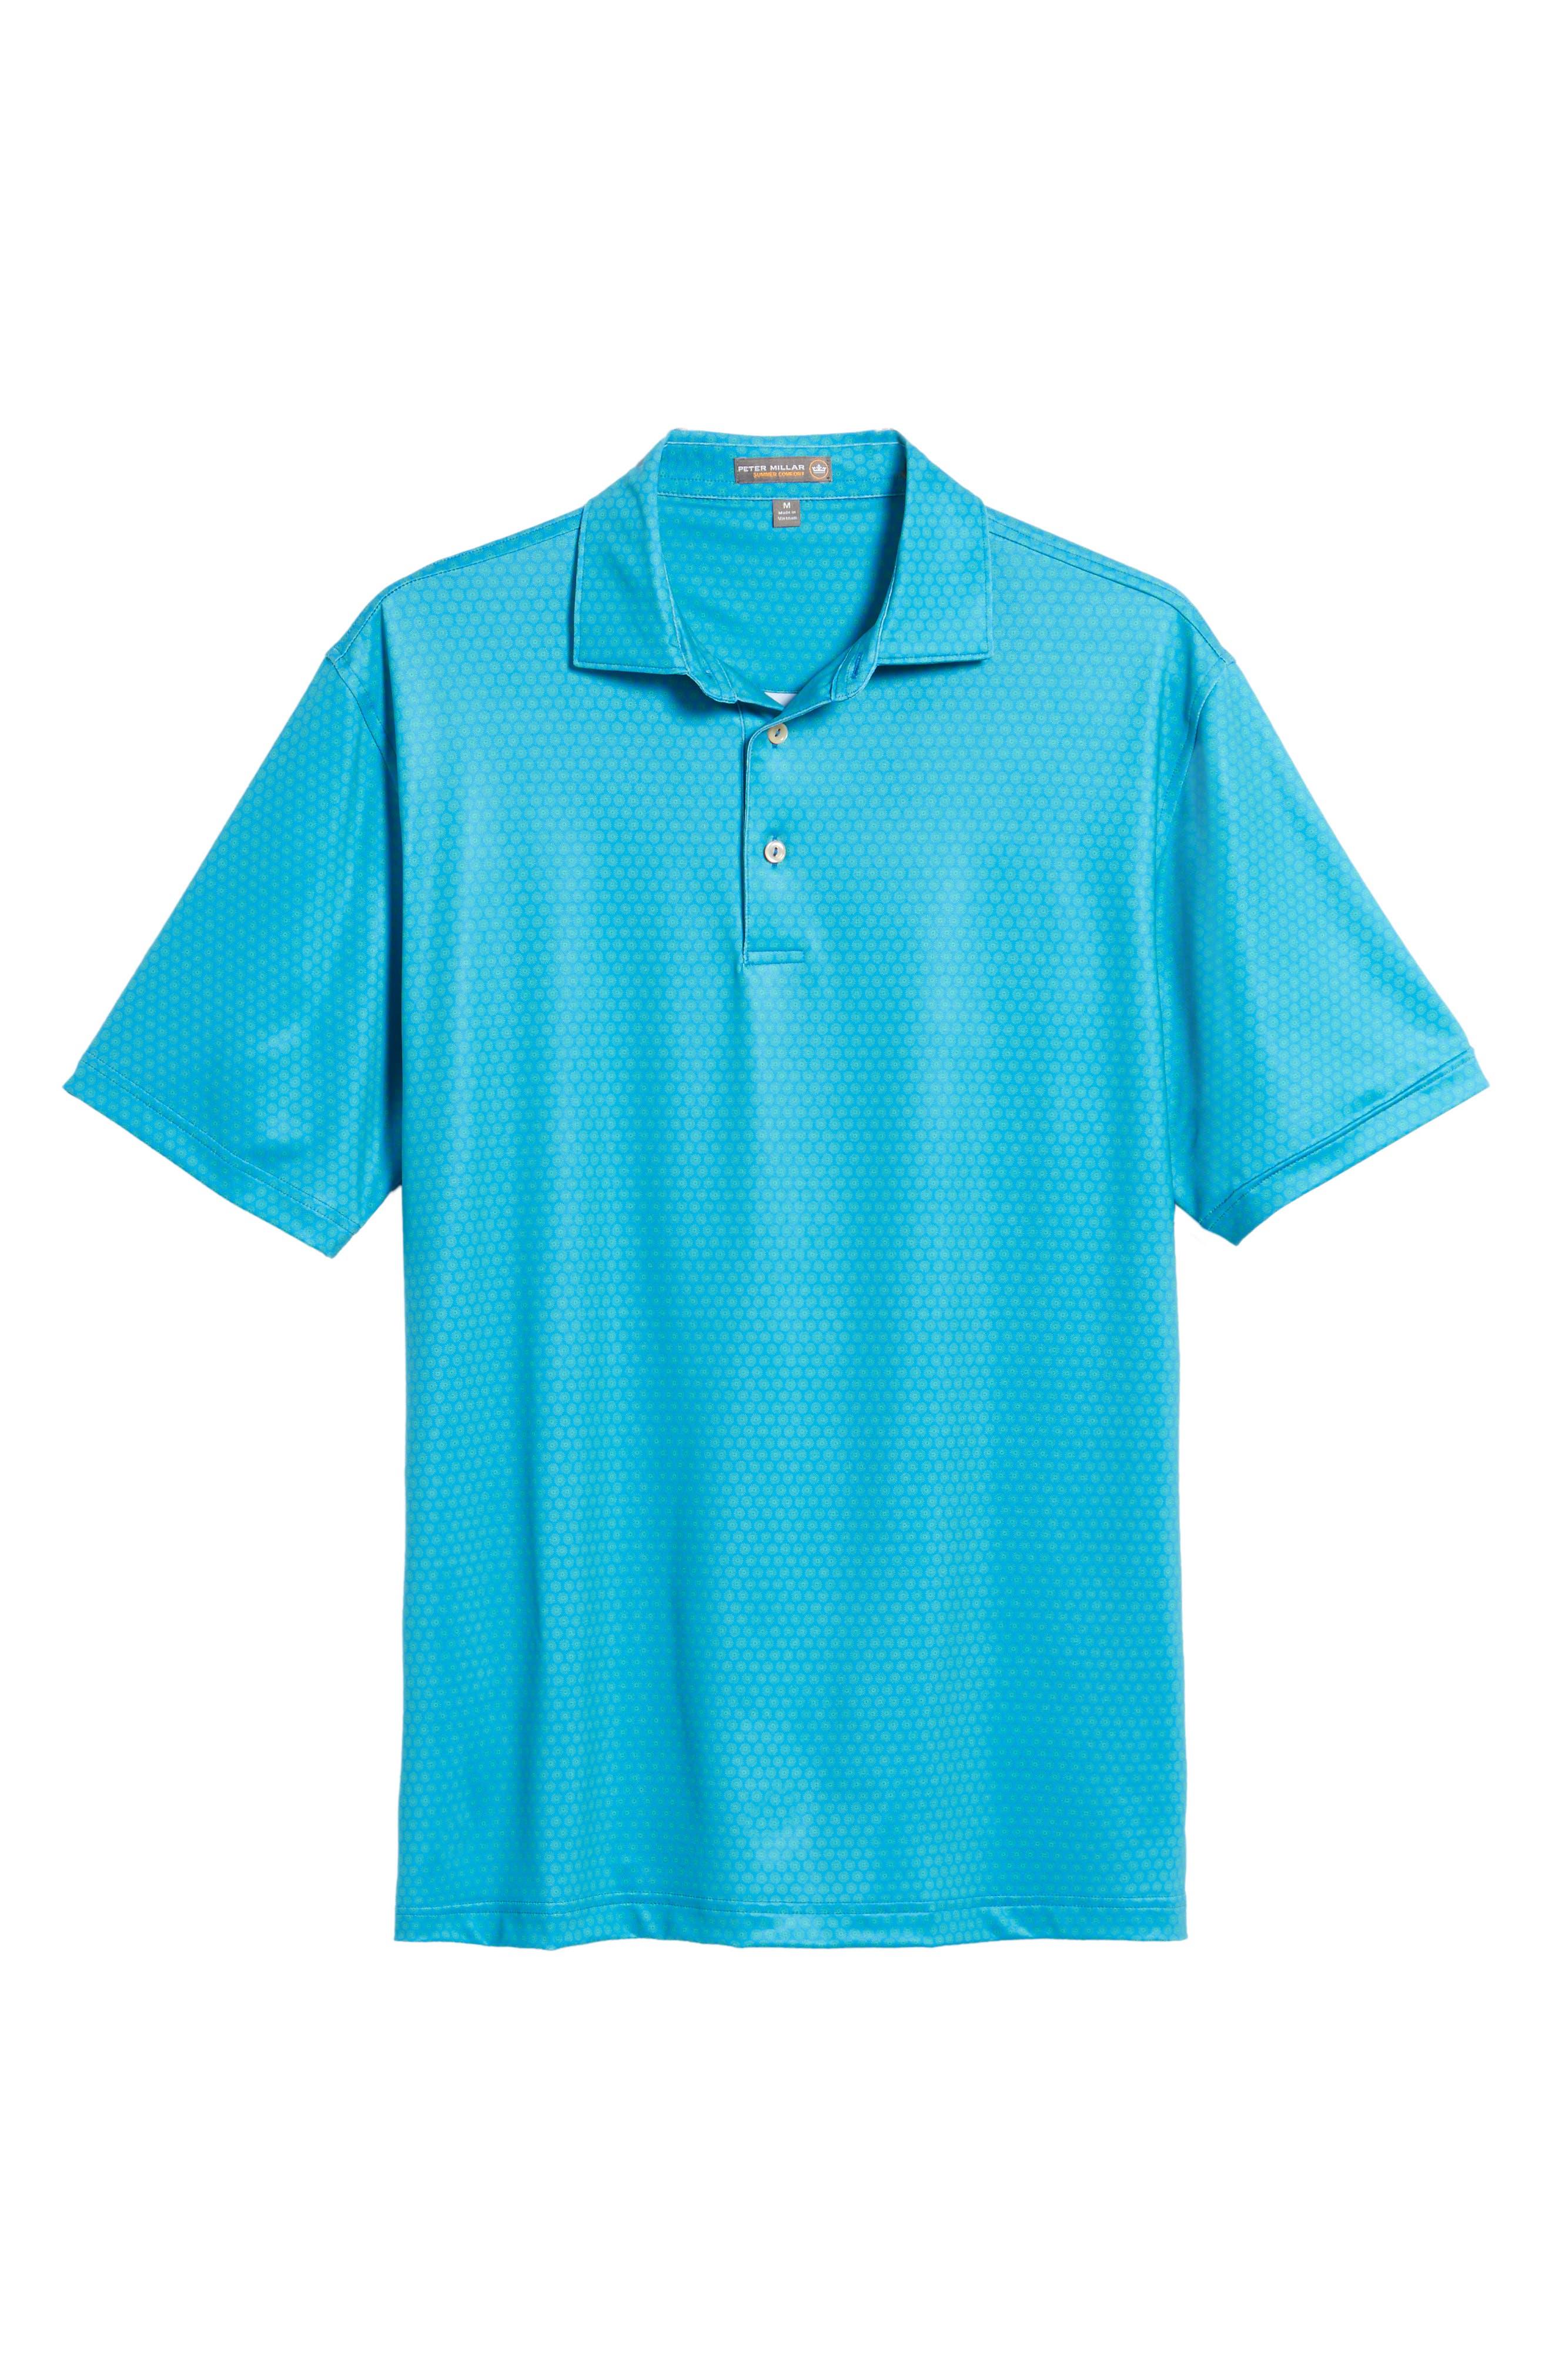 Sean Mata Sunburst Stretch Jersey Polo,                             Alternate thumbnail 6, color,                             403